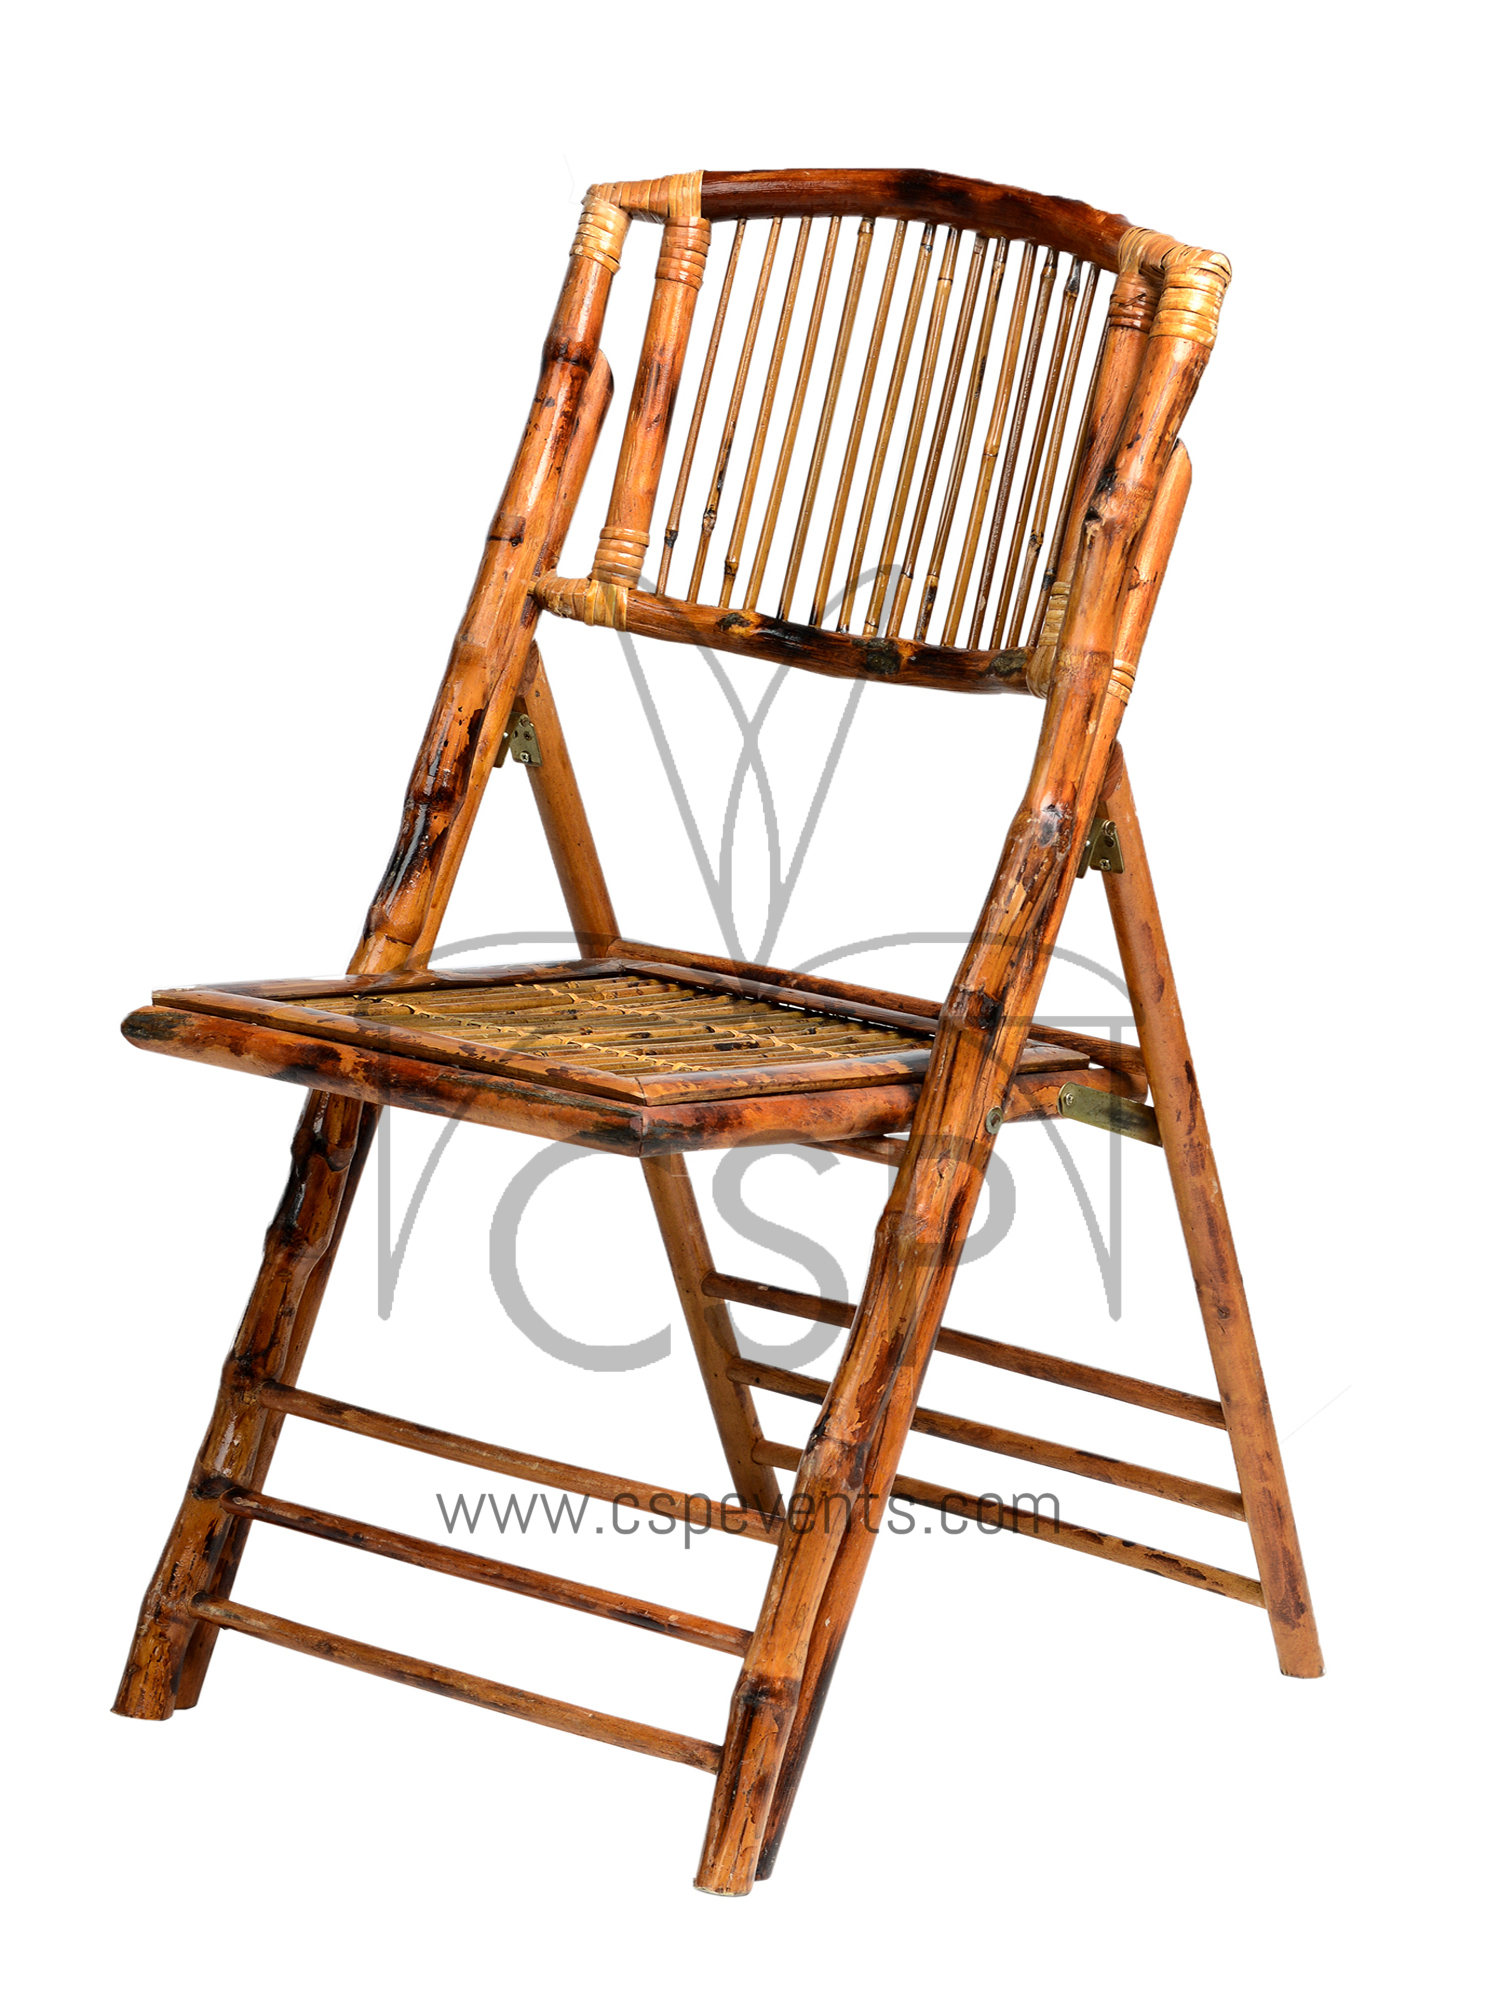 Bamboo Folding Chair Csp